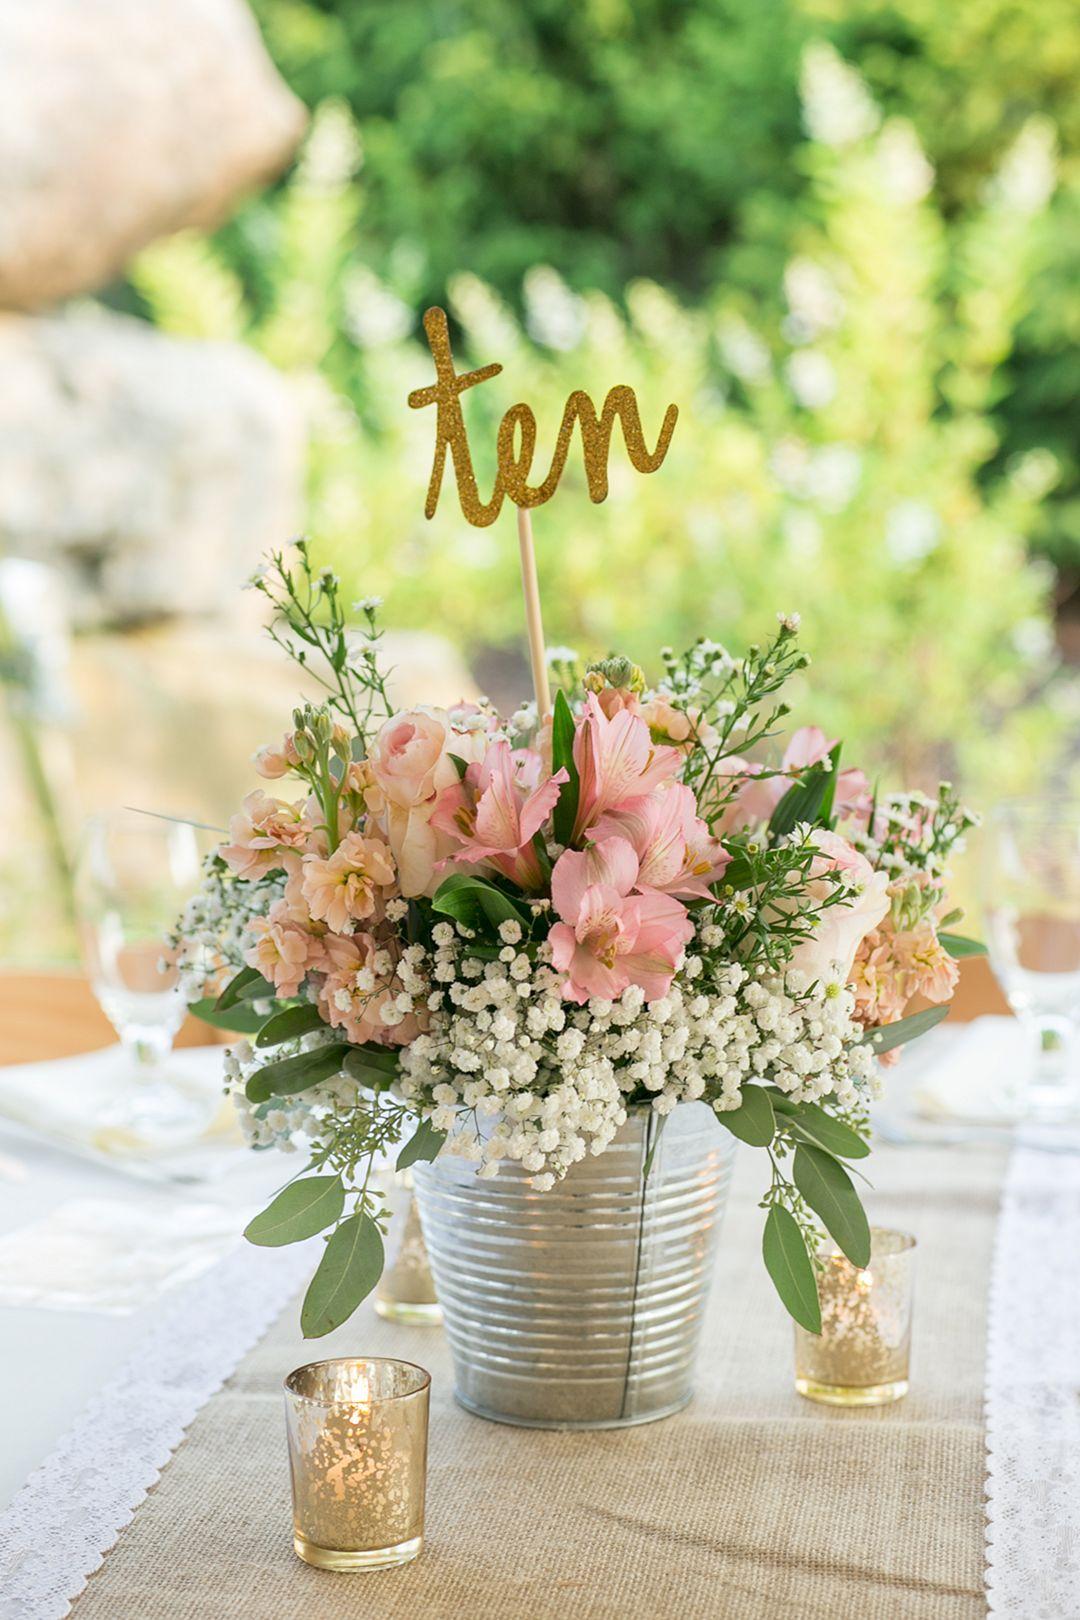 35 Diy Creative Rustic Chic Wedding Centerpieces Ideas Decorations